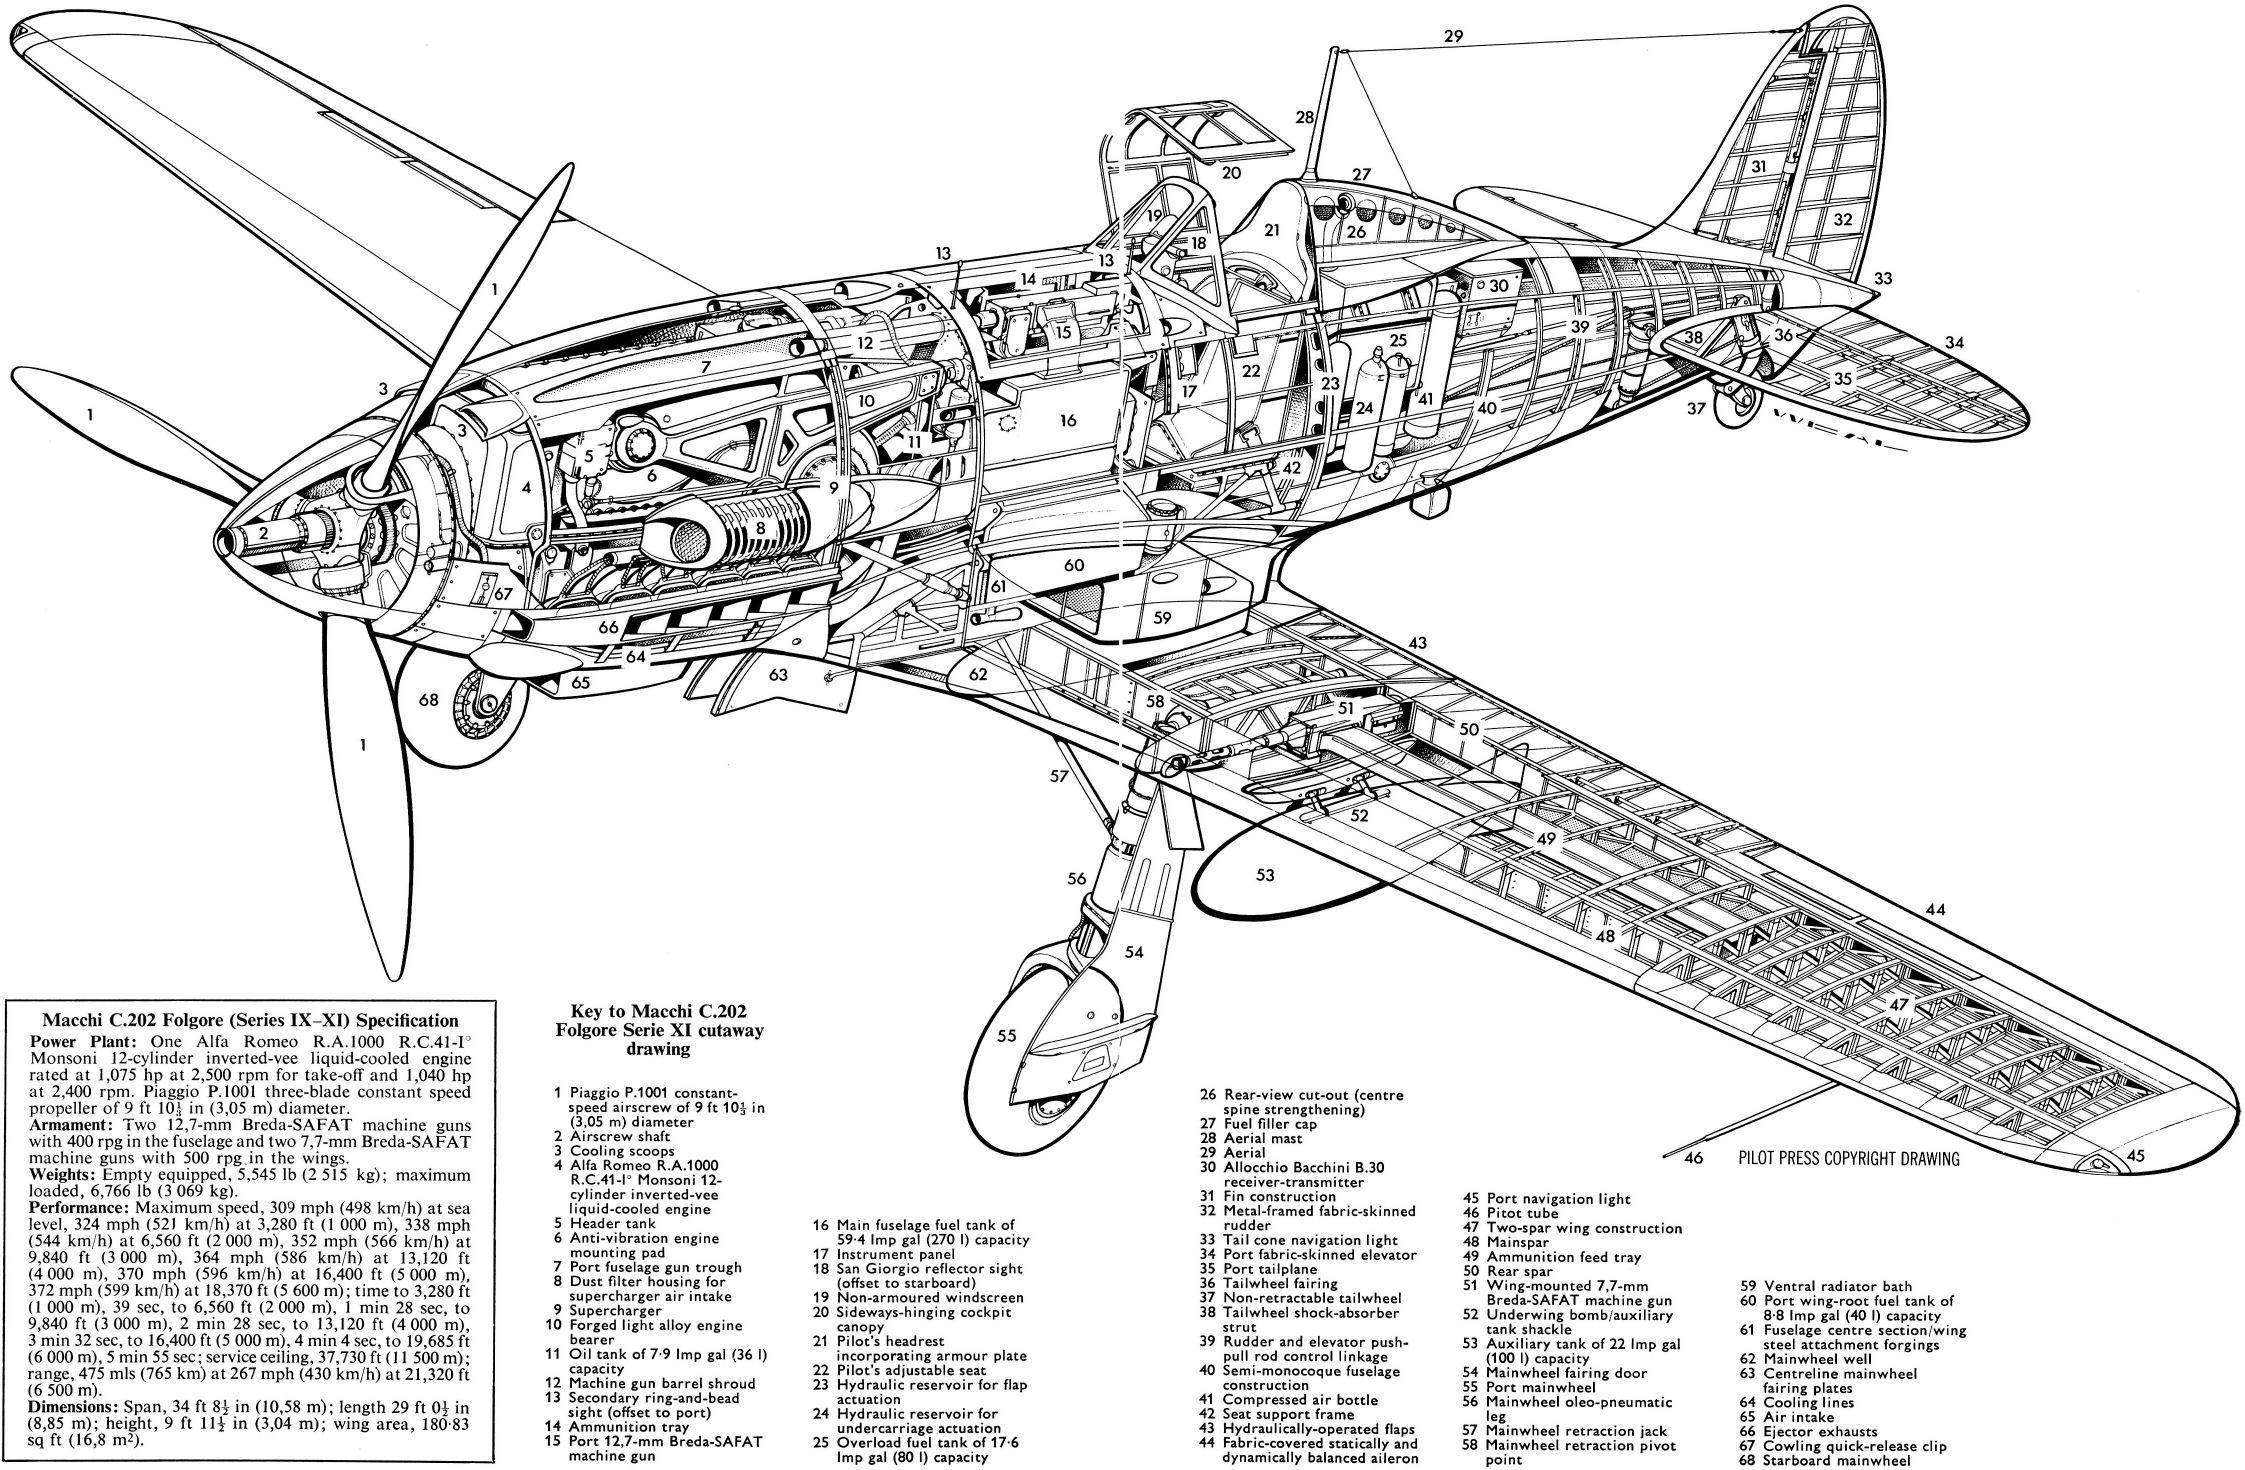 Macchi C 202 Folgore Series Ix Xi Cutaways